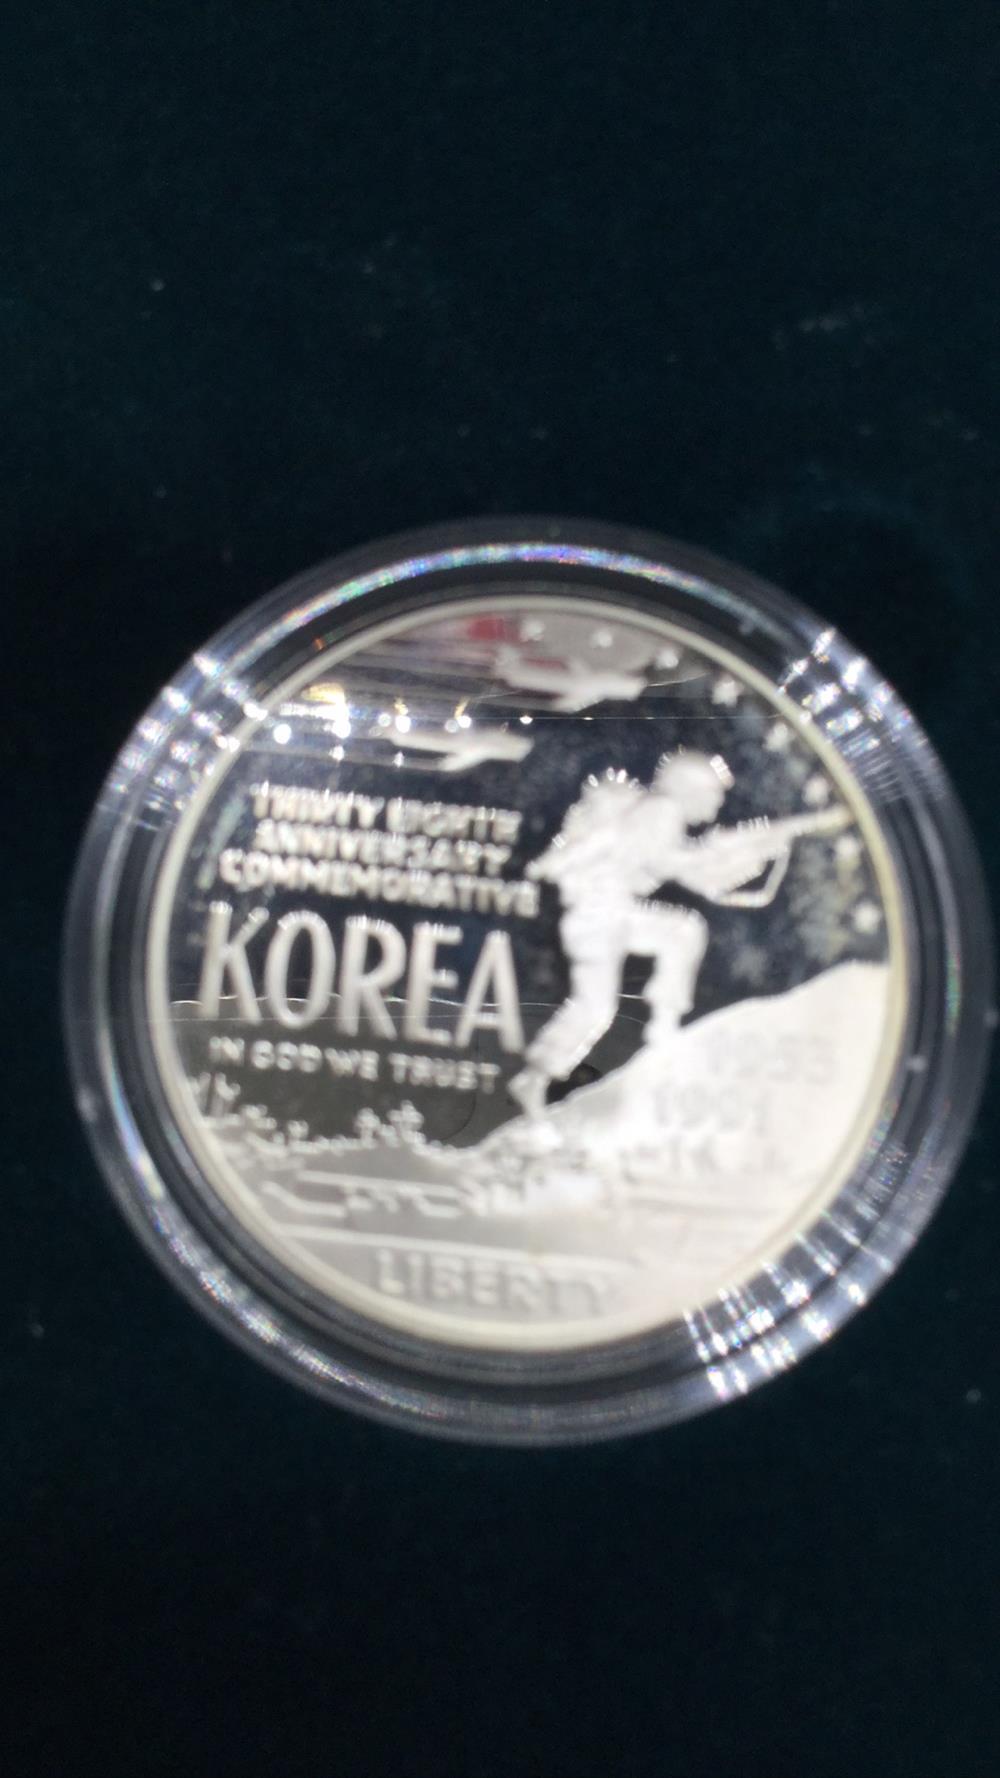 Lot 63: United States mint 1991: Korean war Memorial coin